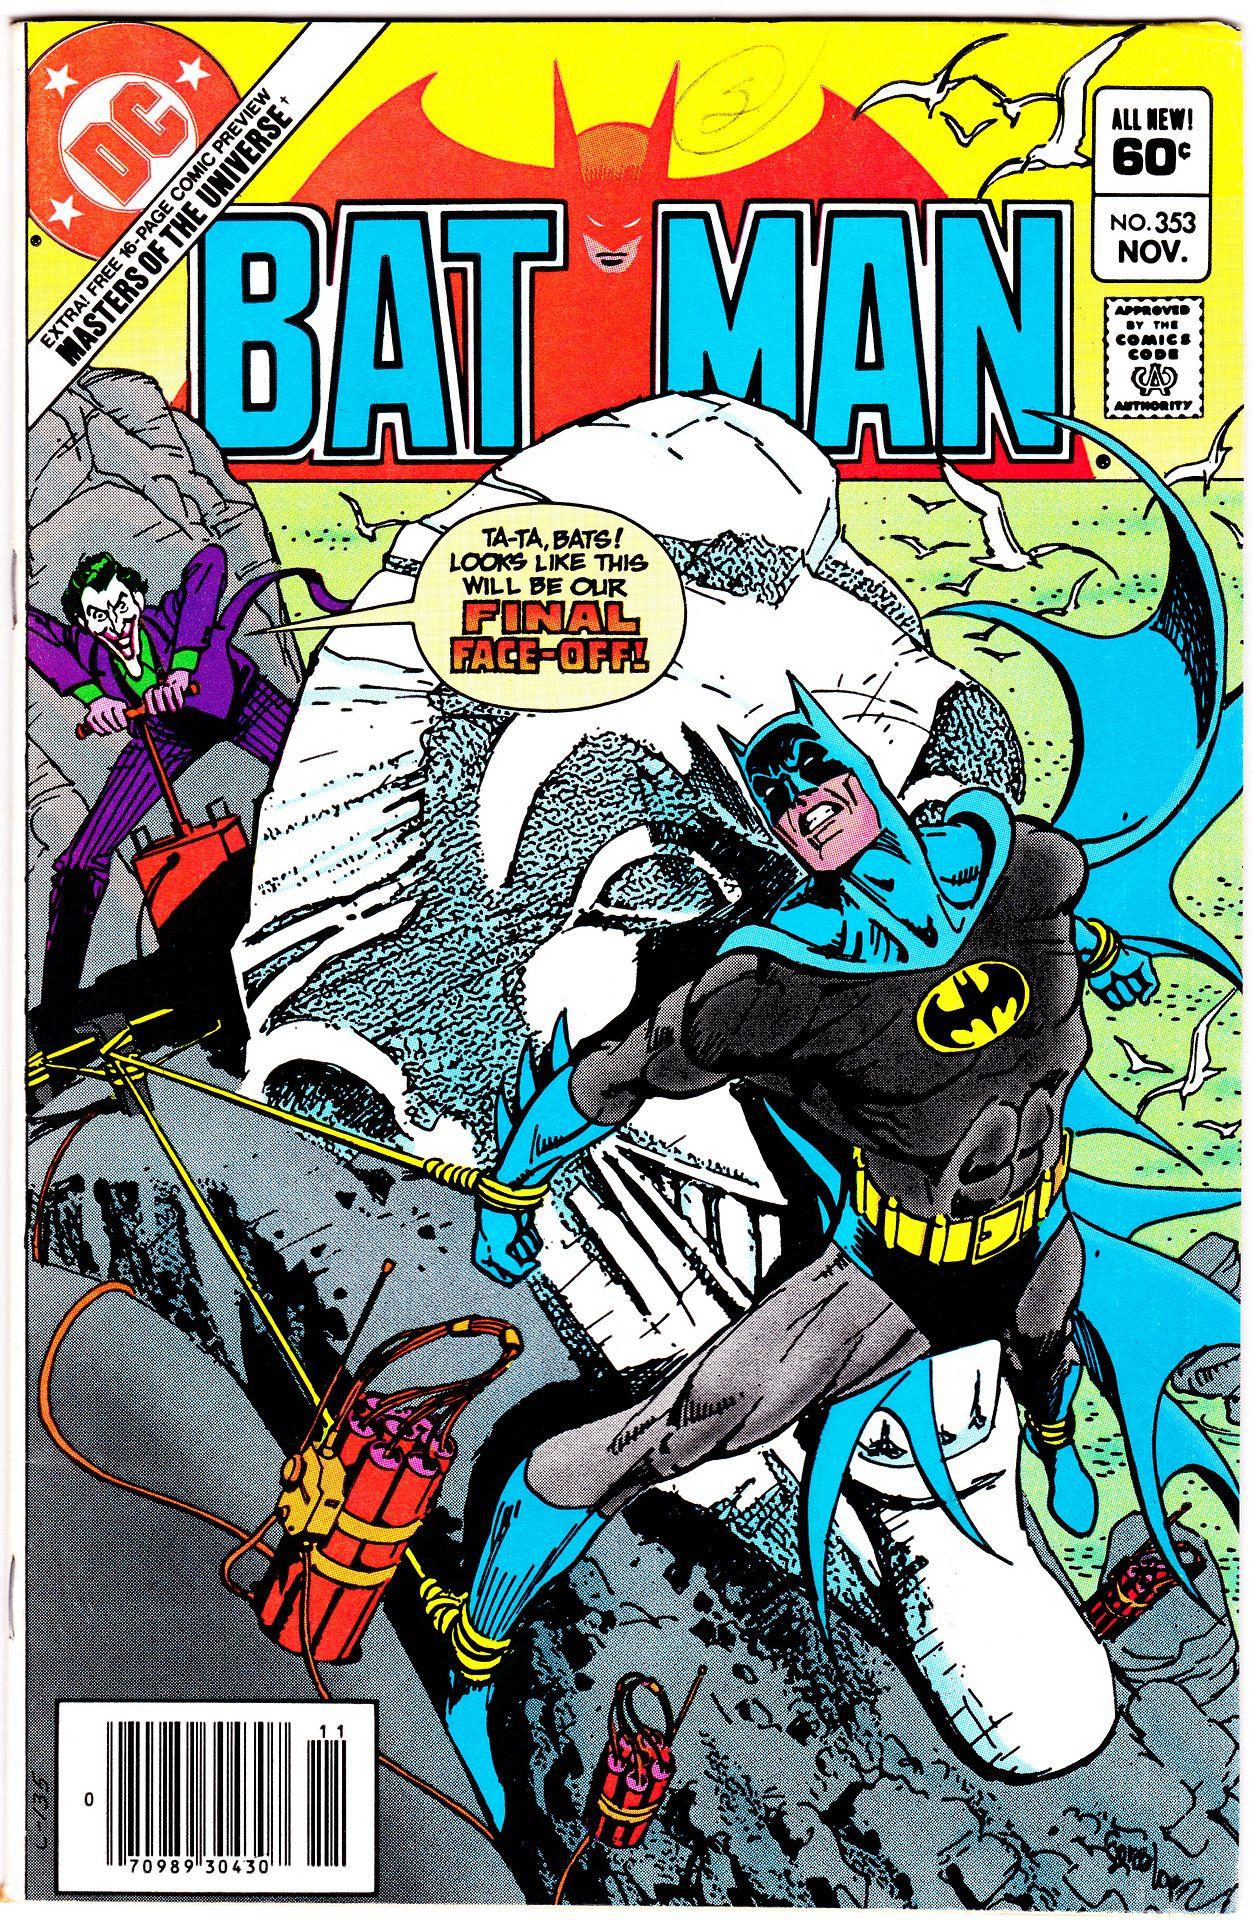 BATMAN #353 (Nov. 1982)Cover Art by Jose Luis Garcia-Lopez